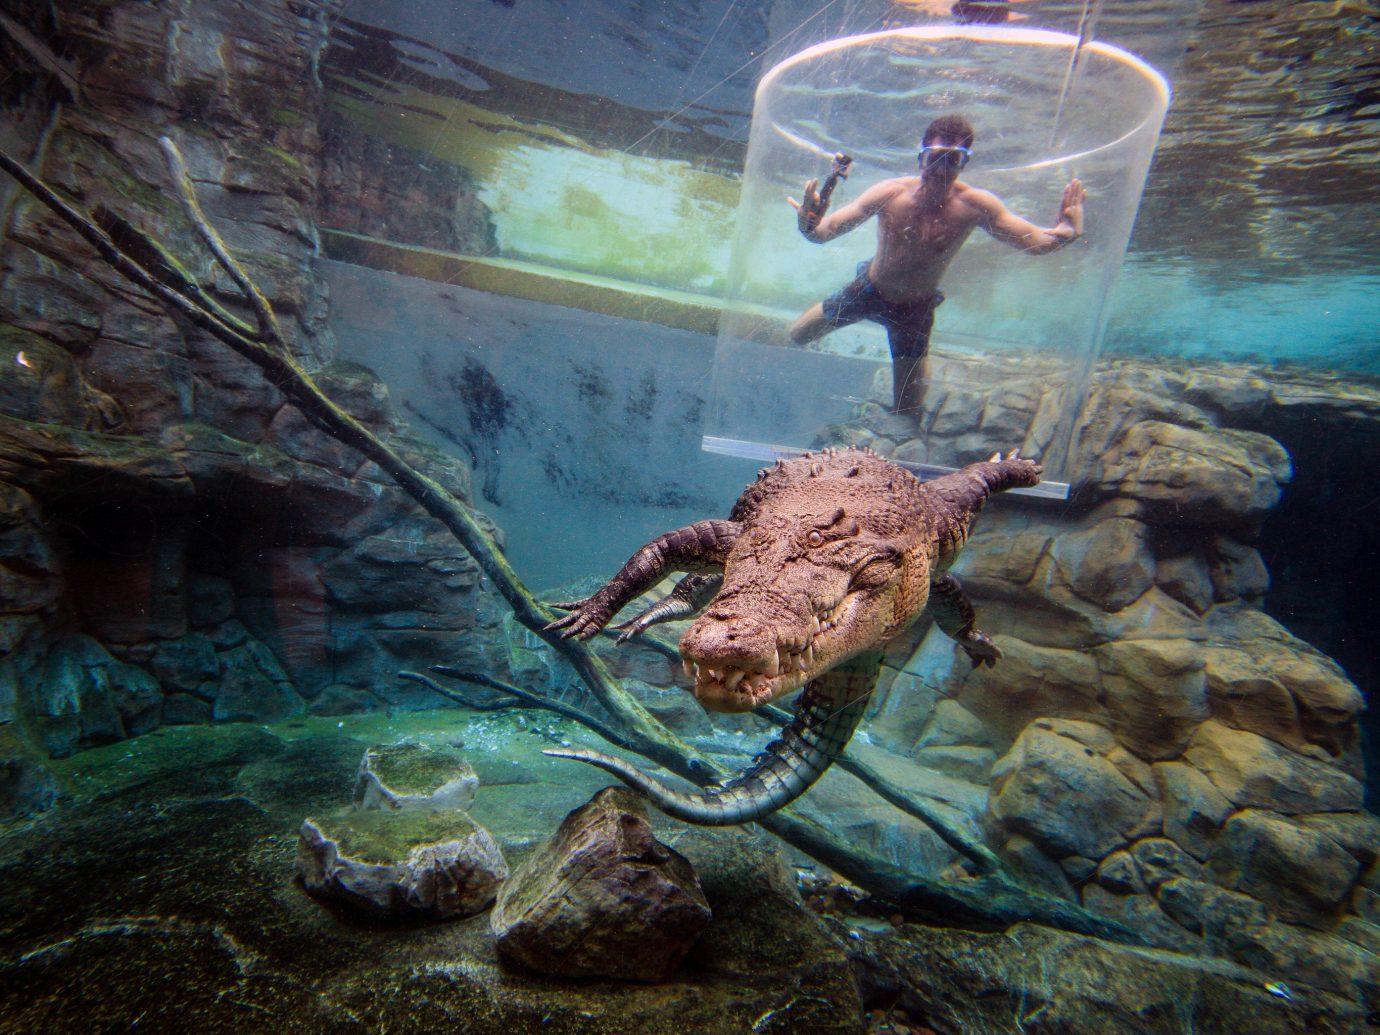 Trip Ideas water rock outdoor underwater organism marine biology screenshot ocean floor